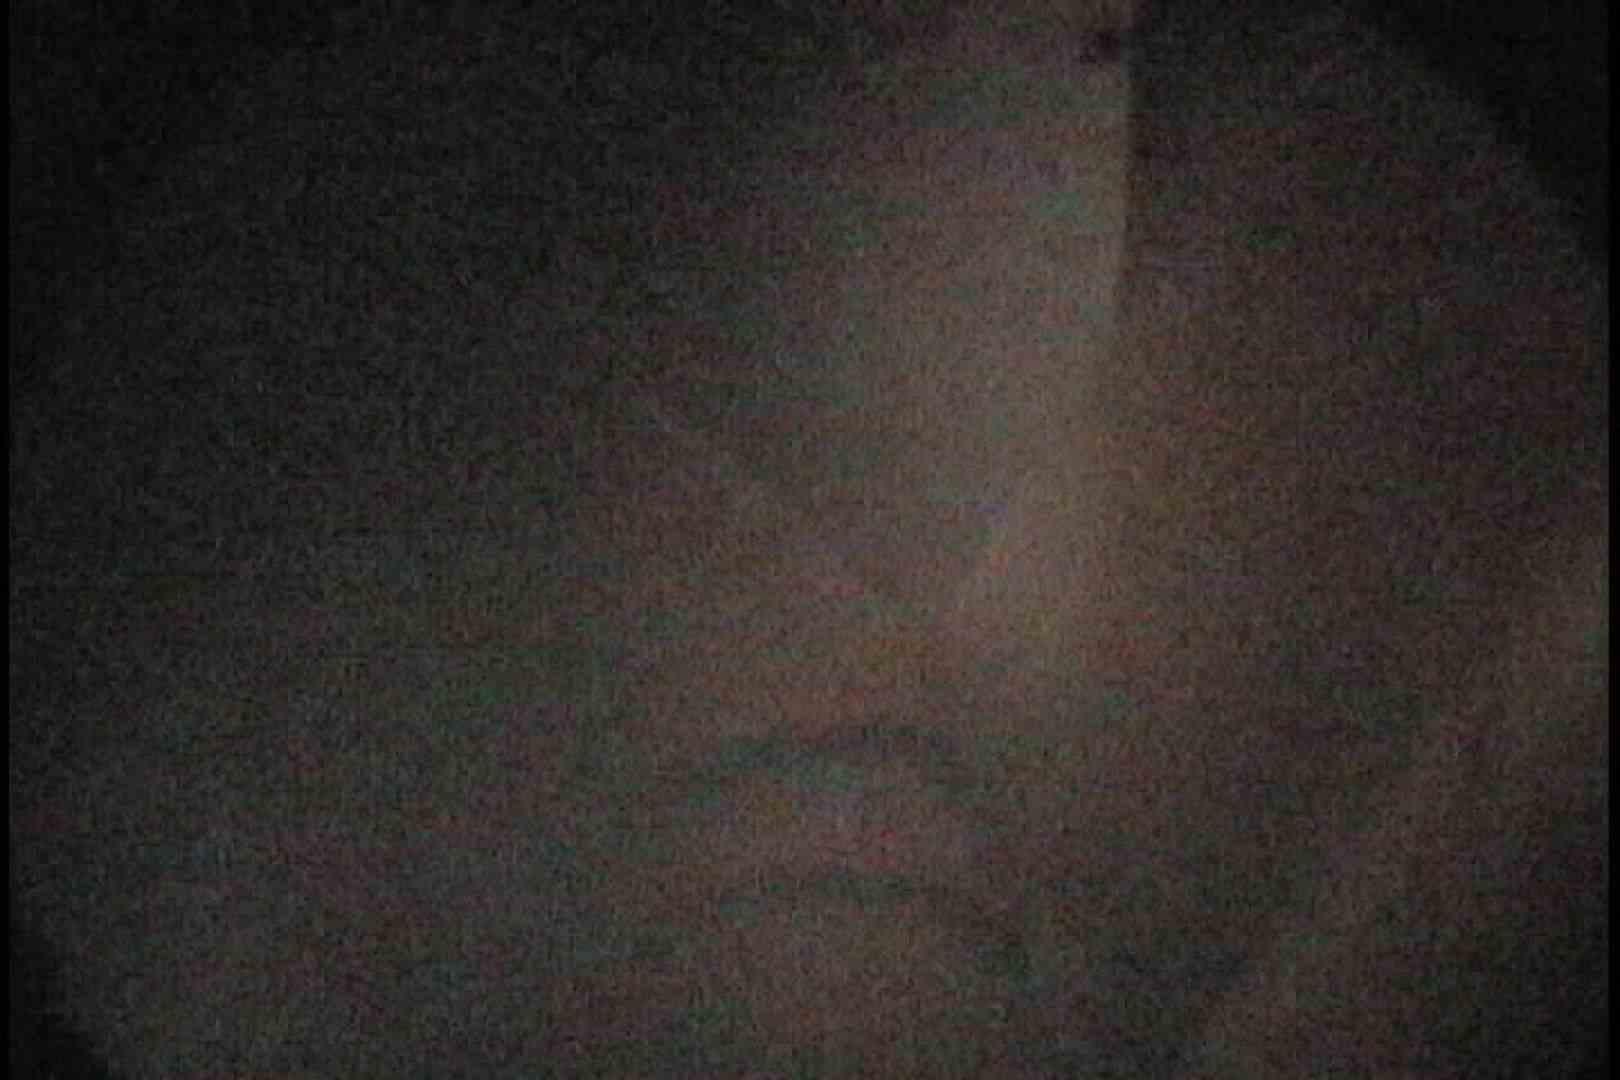 No.111  カメラに向けられる鋭い視線が! シャワー室   むっちりガール  101枚 79